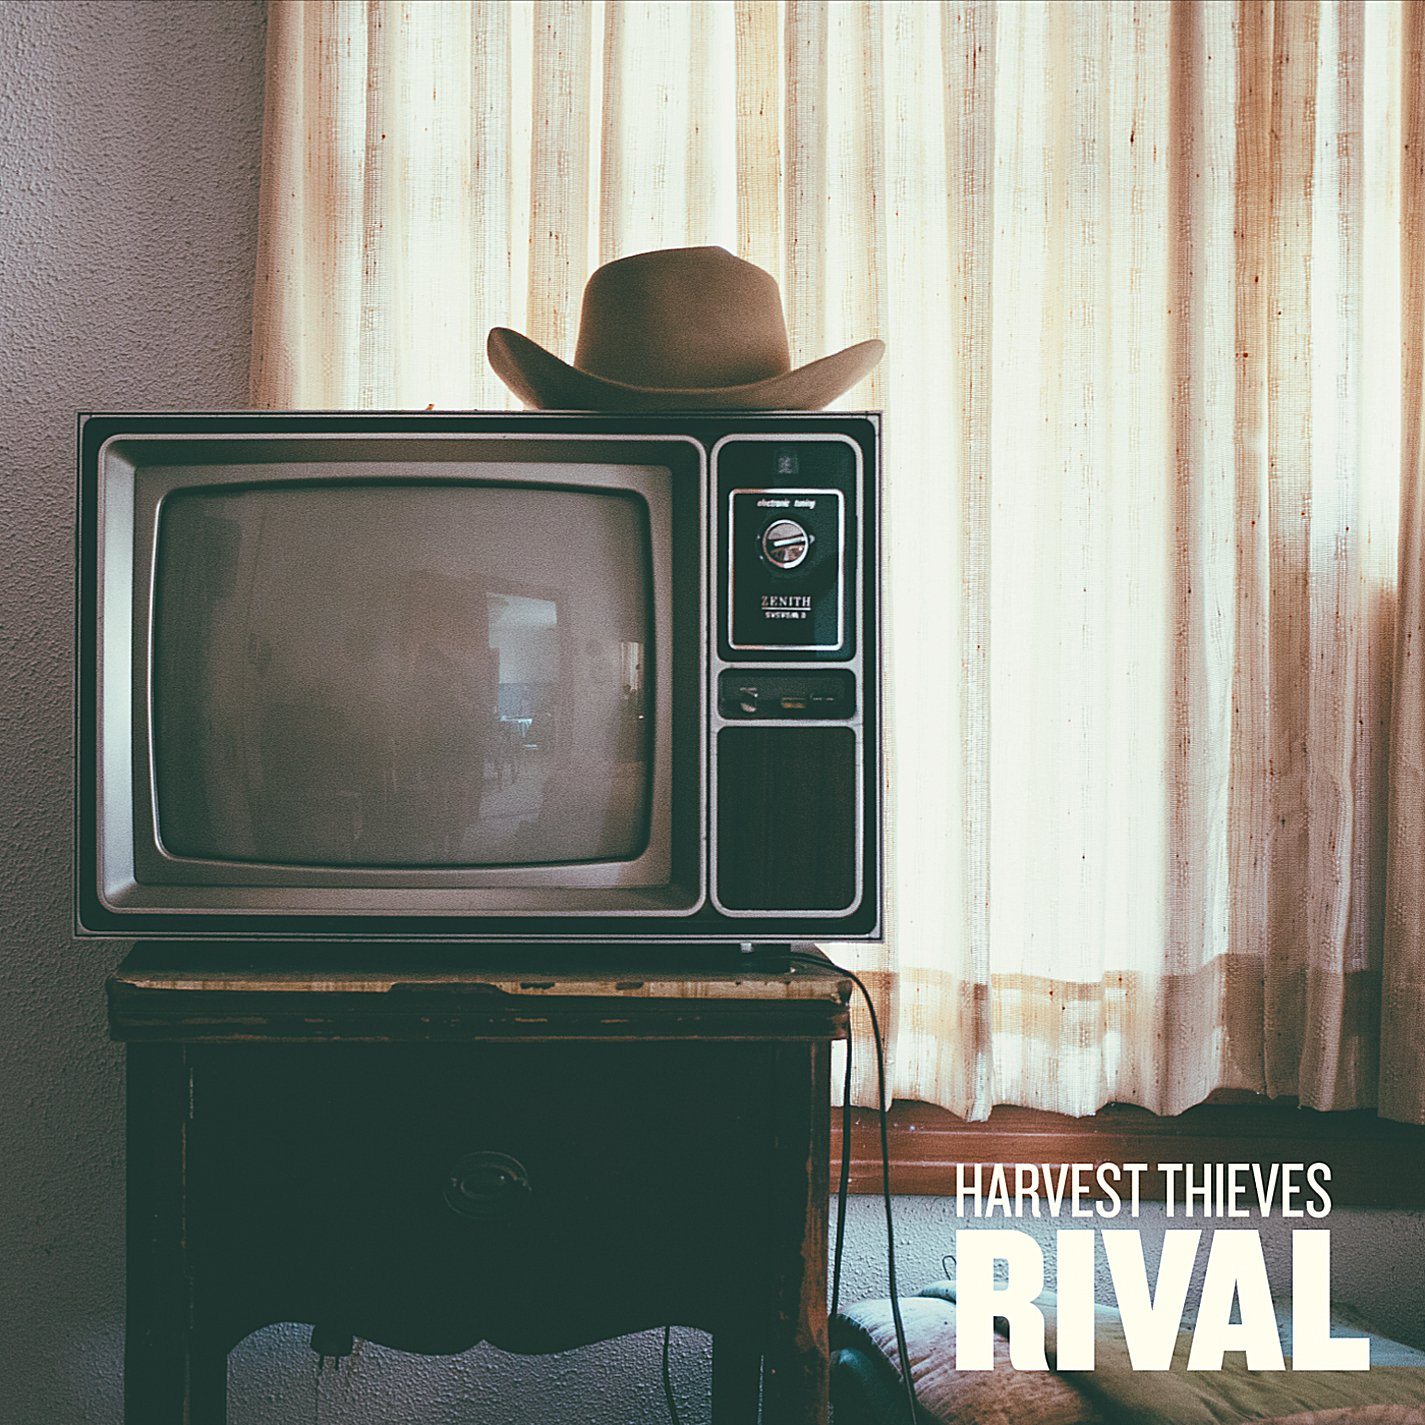 Rival: Harvest Thieves: Amazon.es: Música